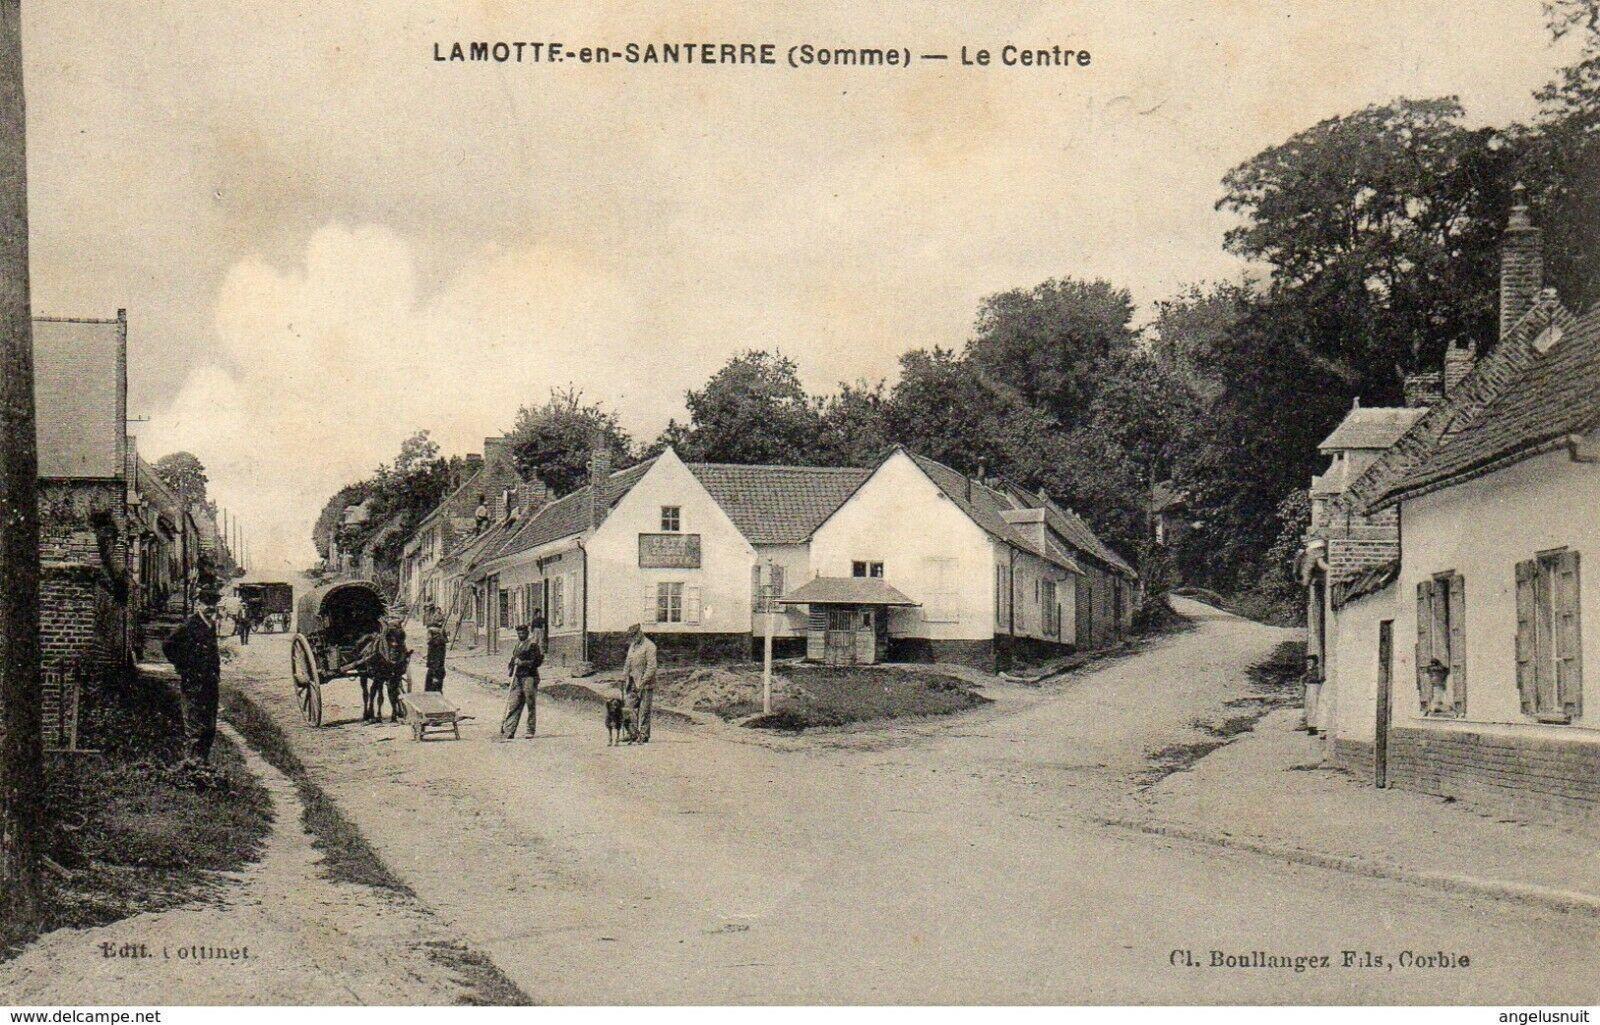 Lamotte